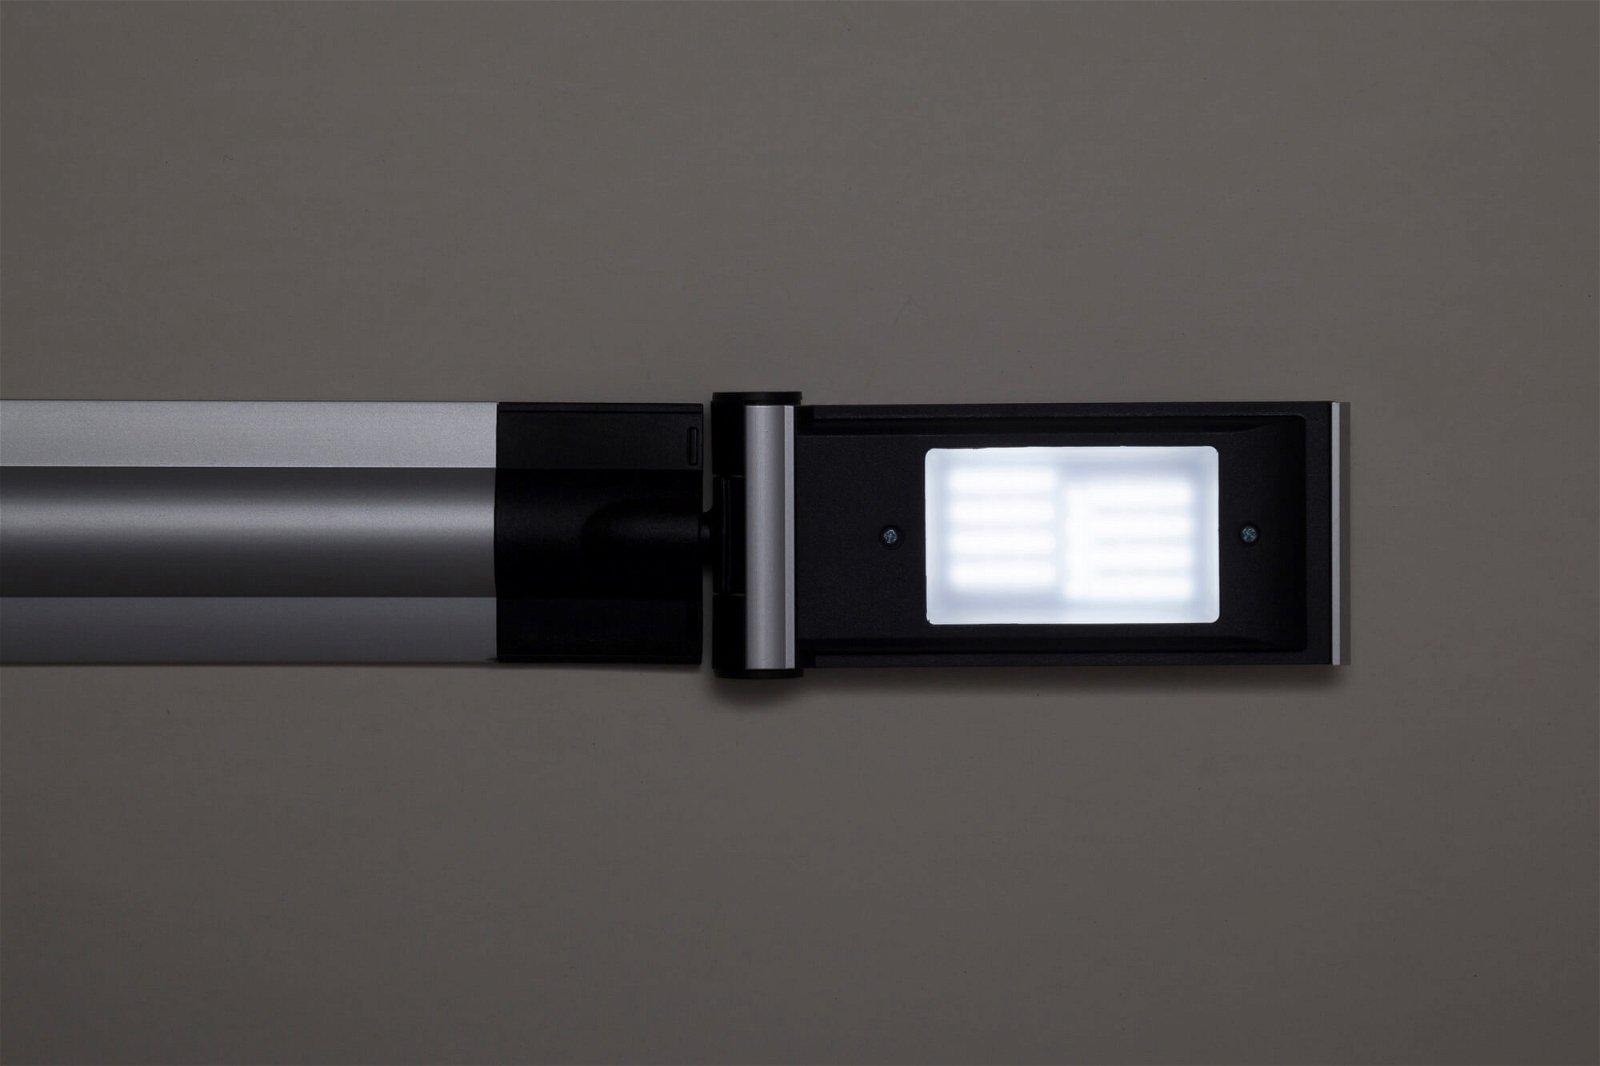 LED-Tischleuchte MAULoptimus, colour vario, dim., Klemmfuß, silber